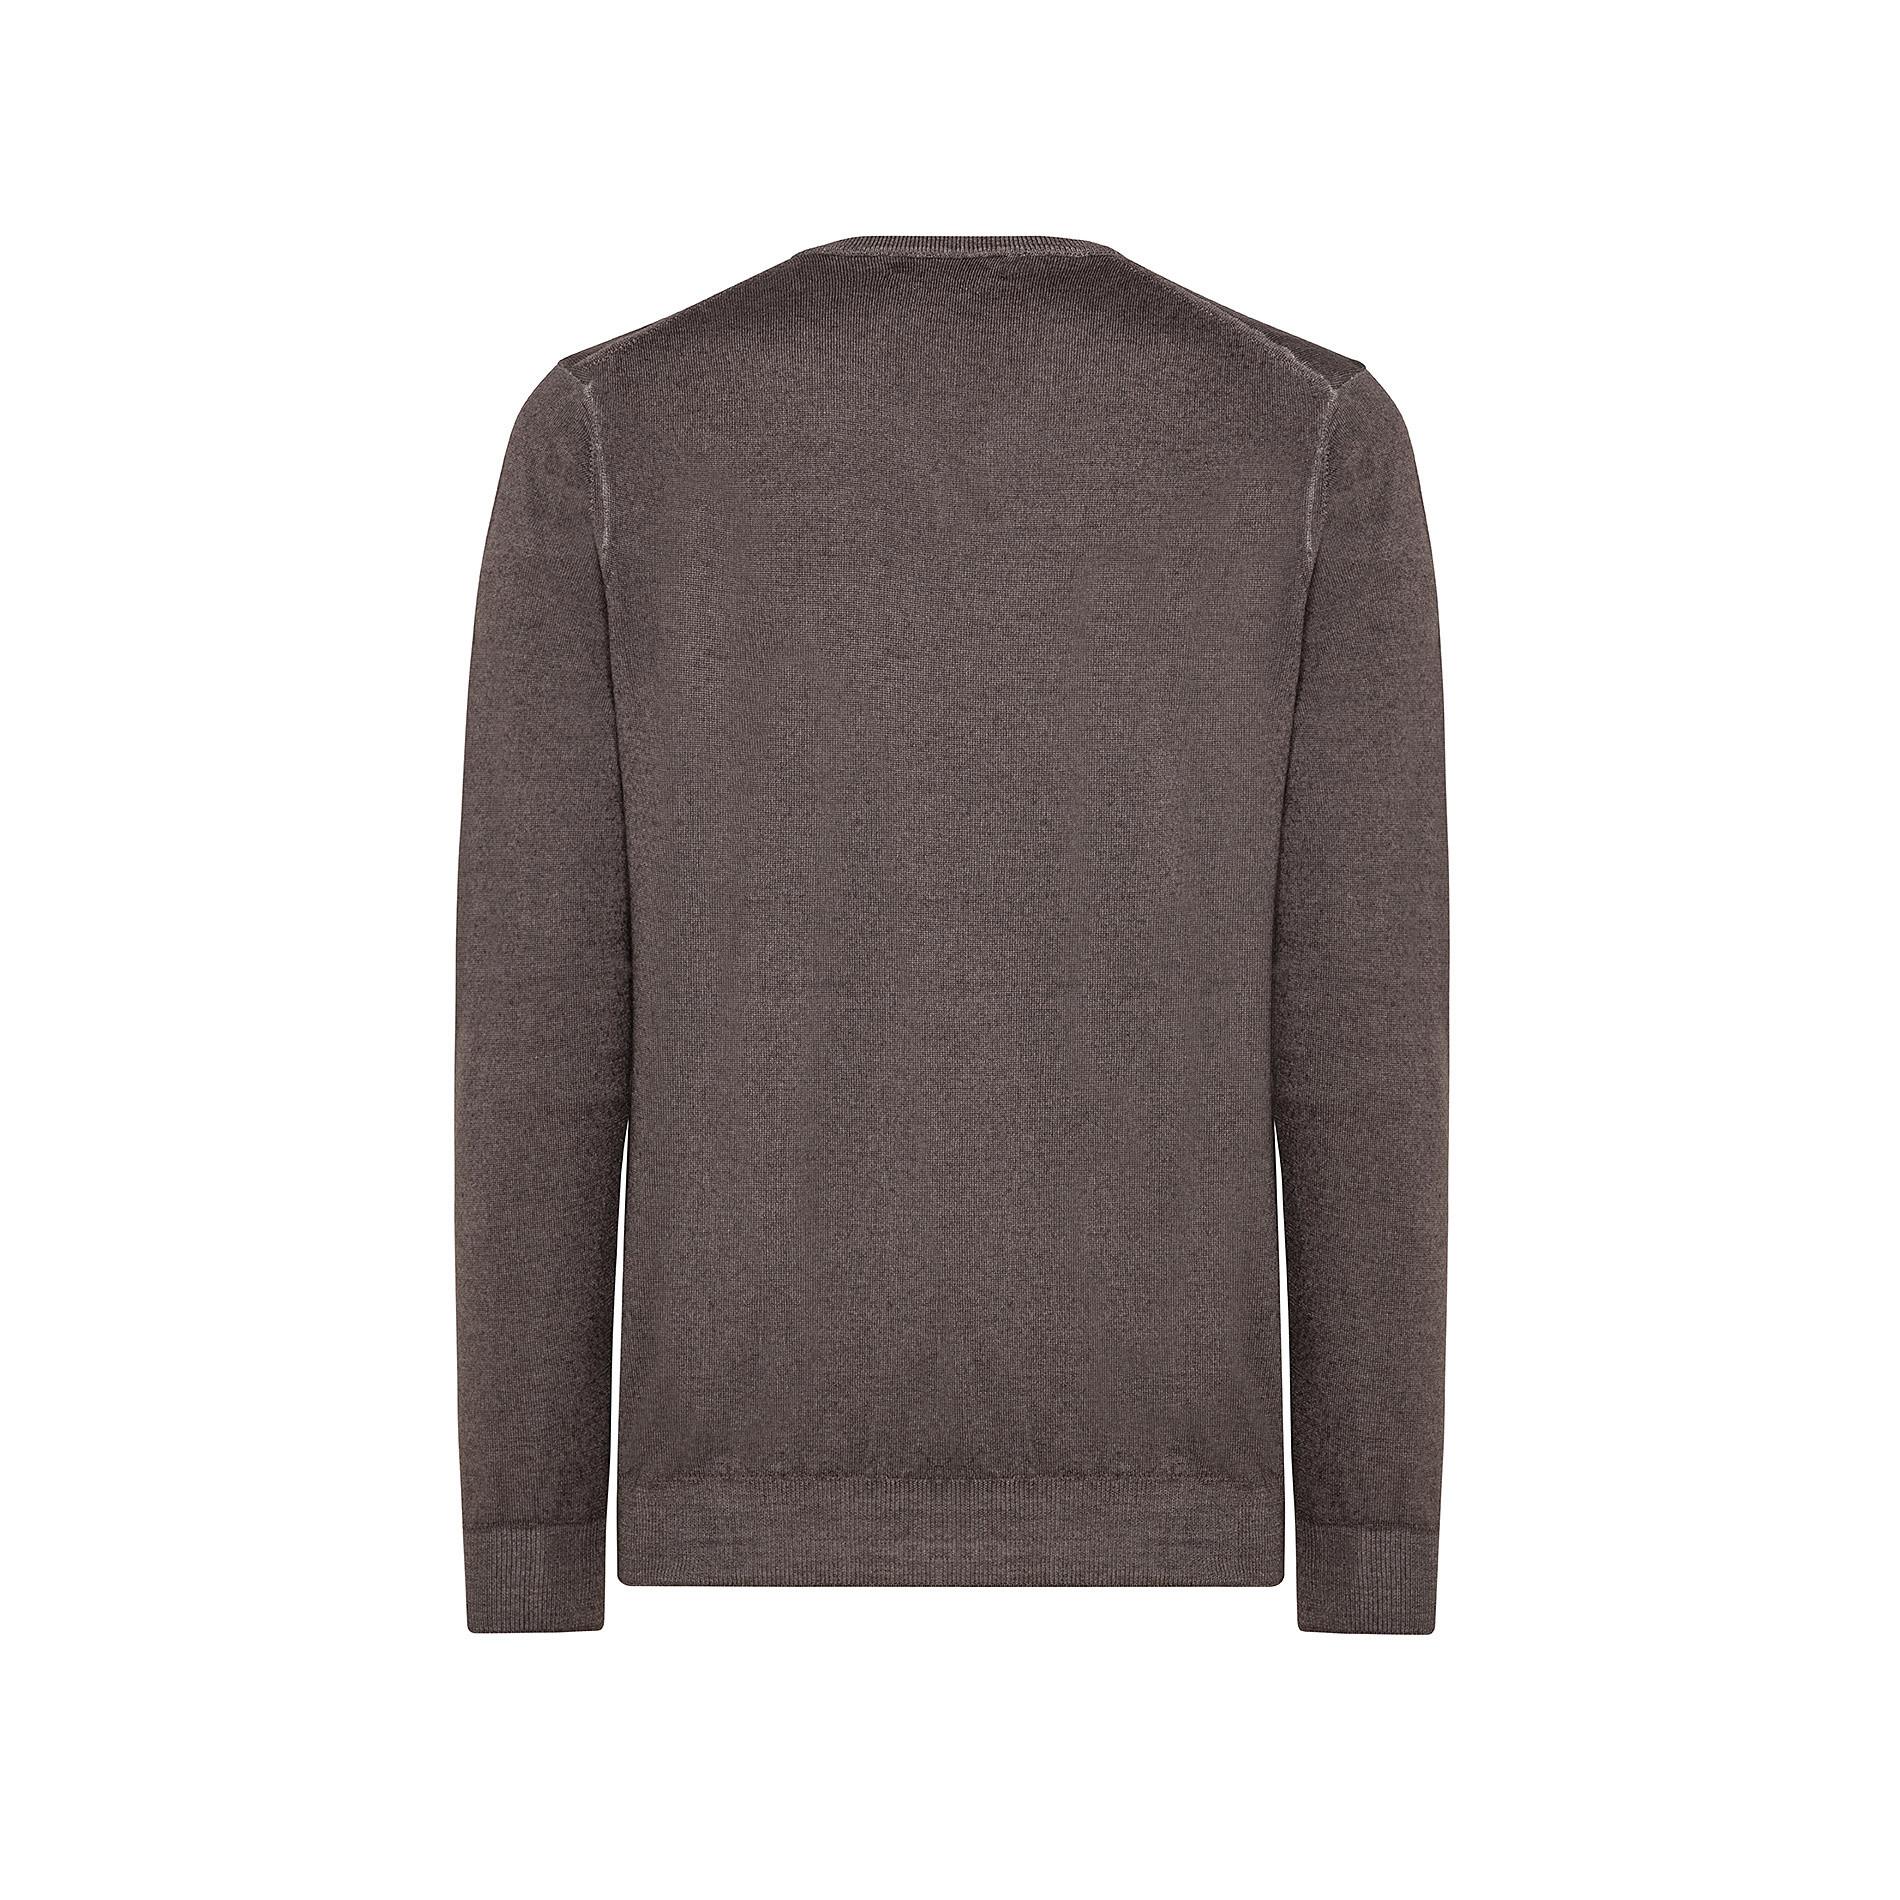 Pullover lana merinos scollo a V, Marrone scuro, large image number 1